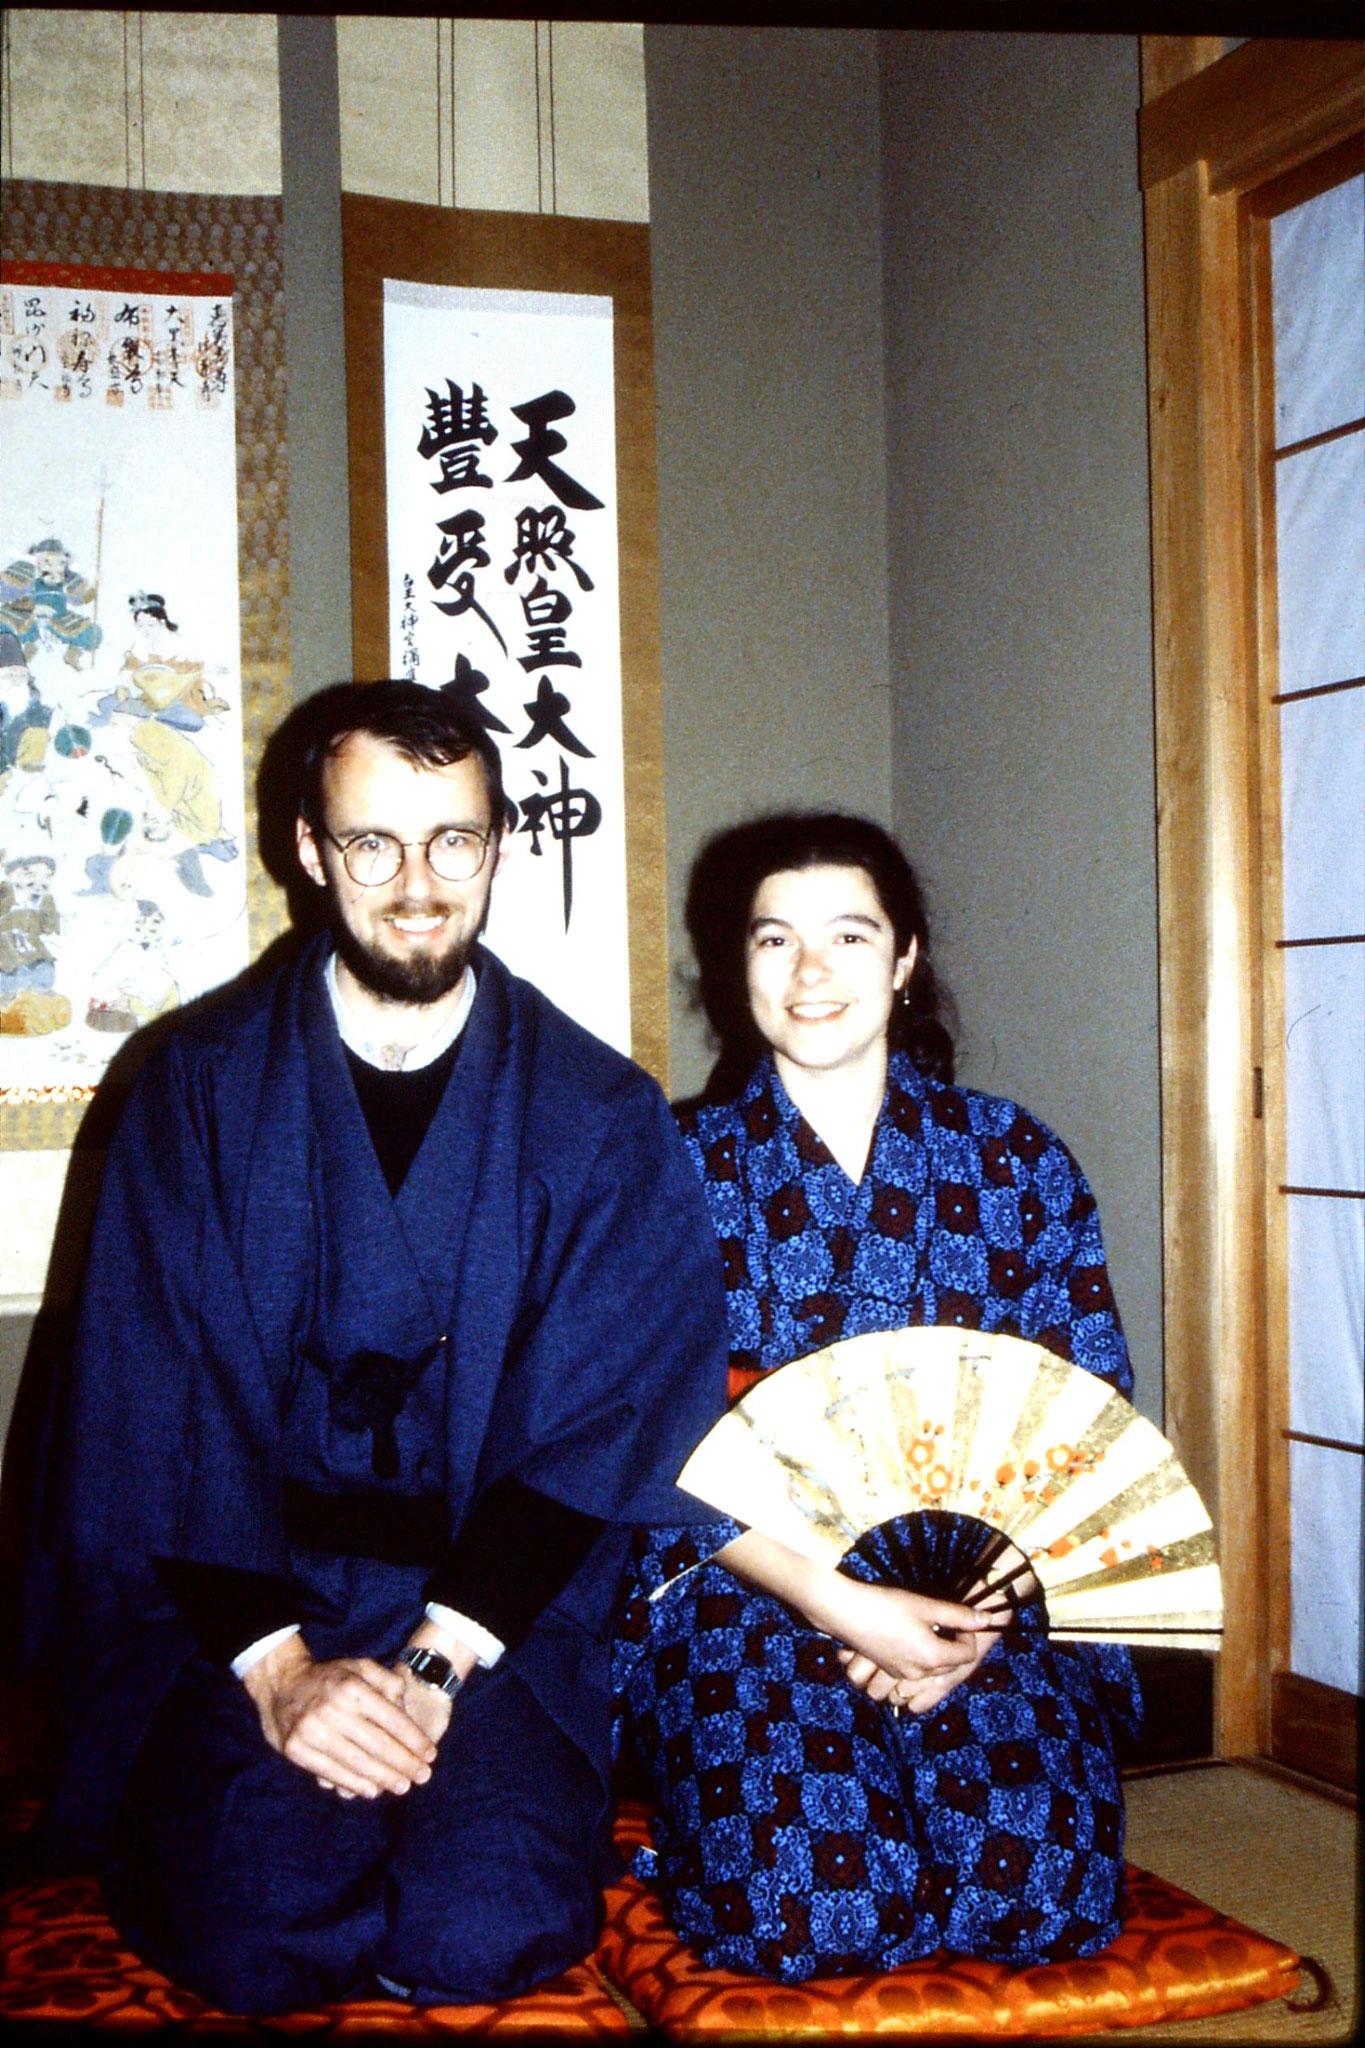 26/1/1989: 10: Kyoto